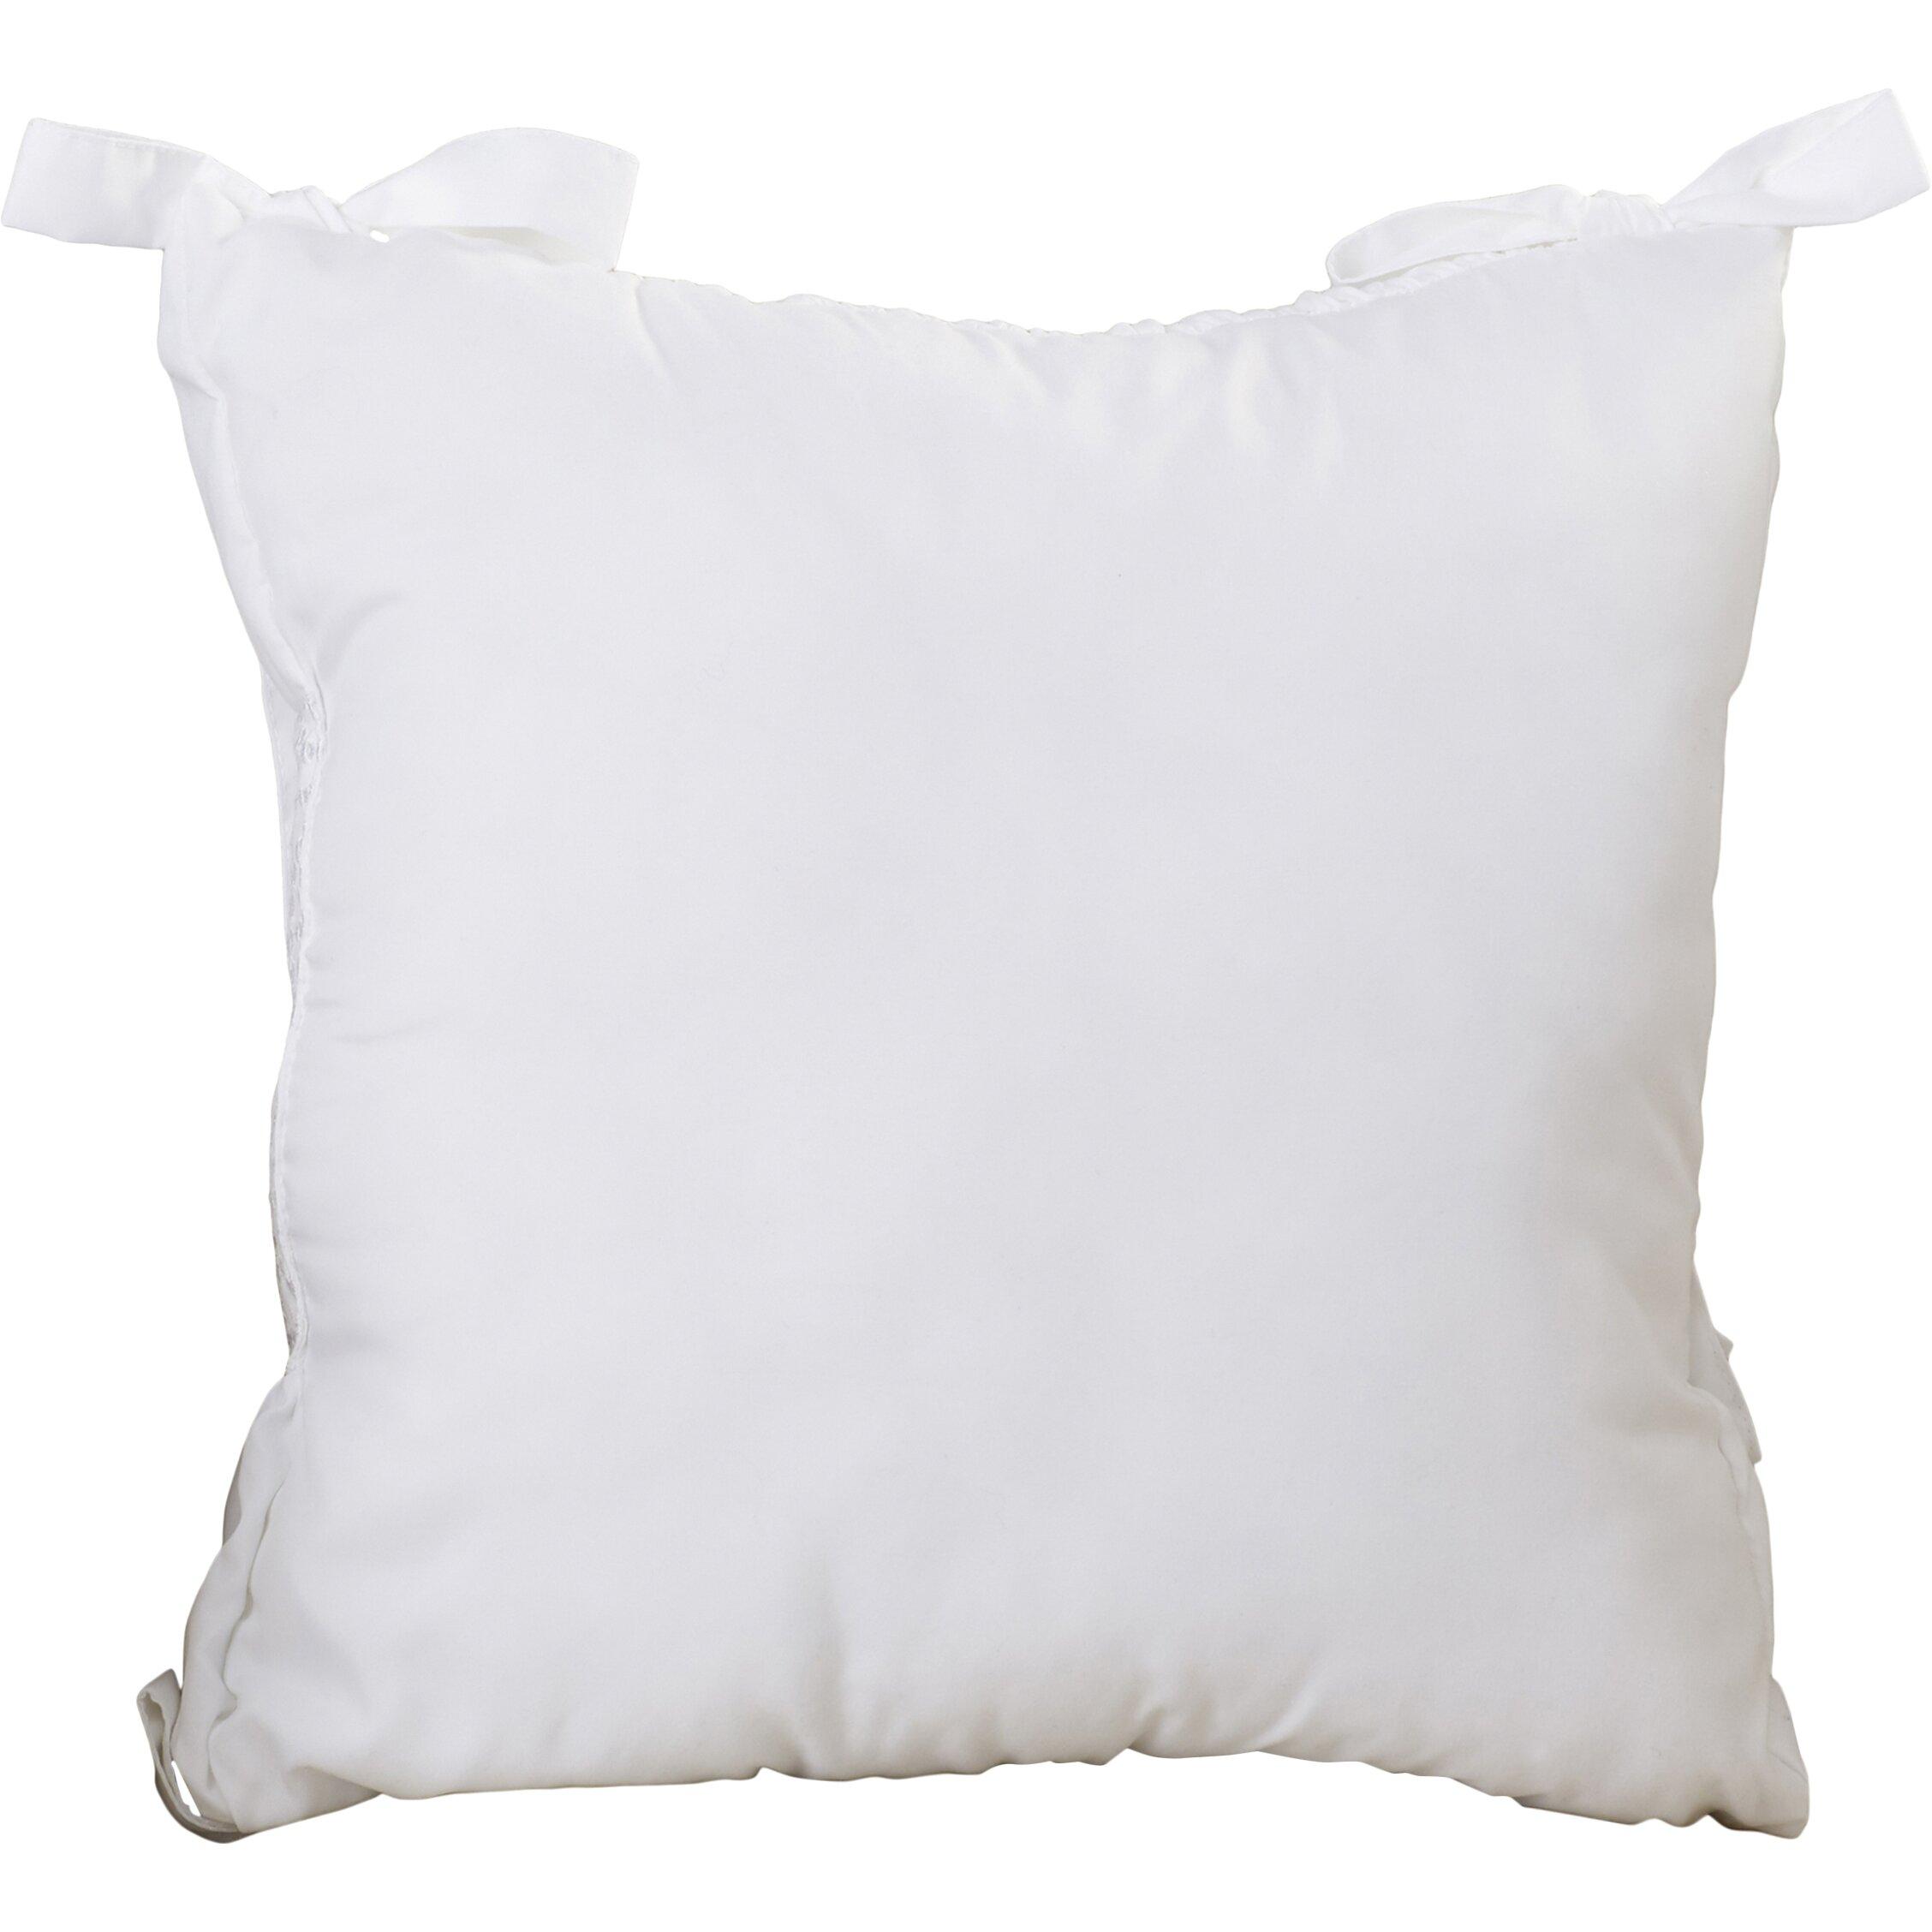 Viv + Rae Reb Throw Pillow & Reviews Wayfair.ca